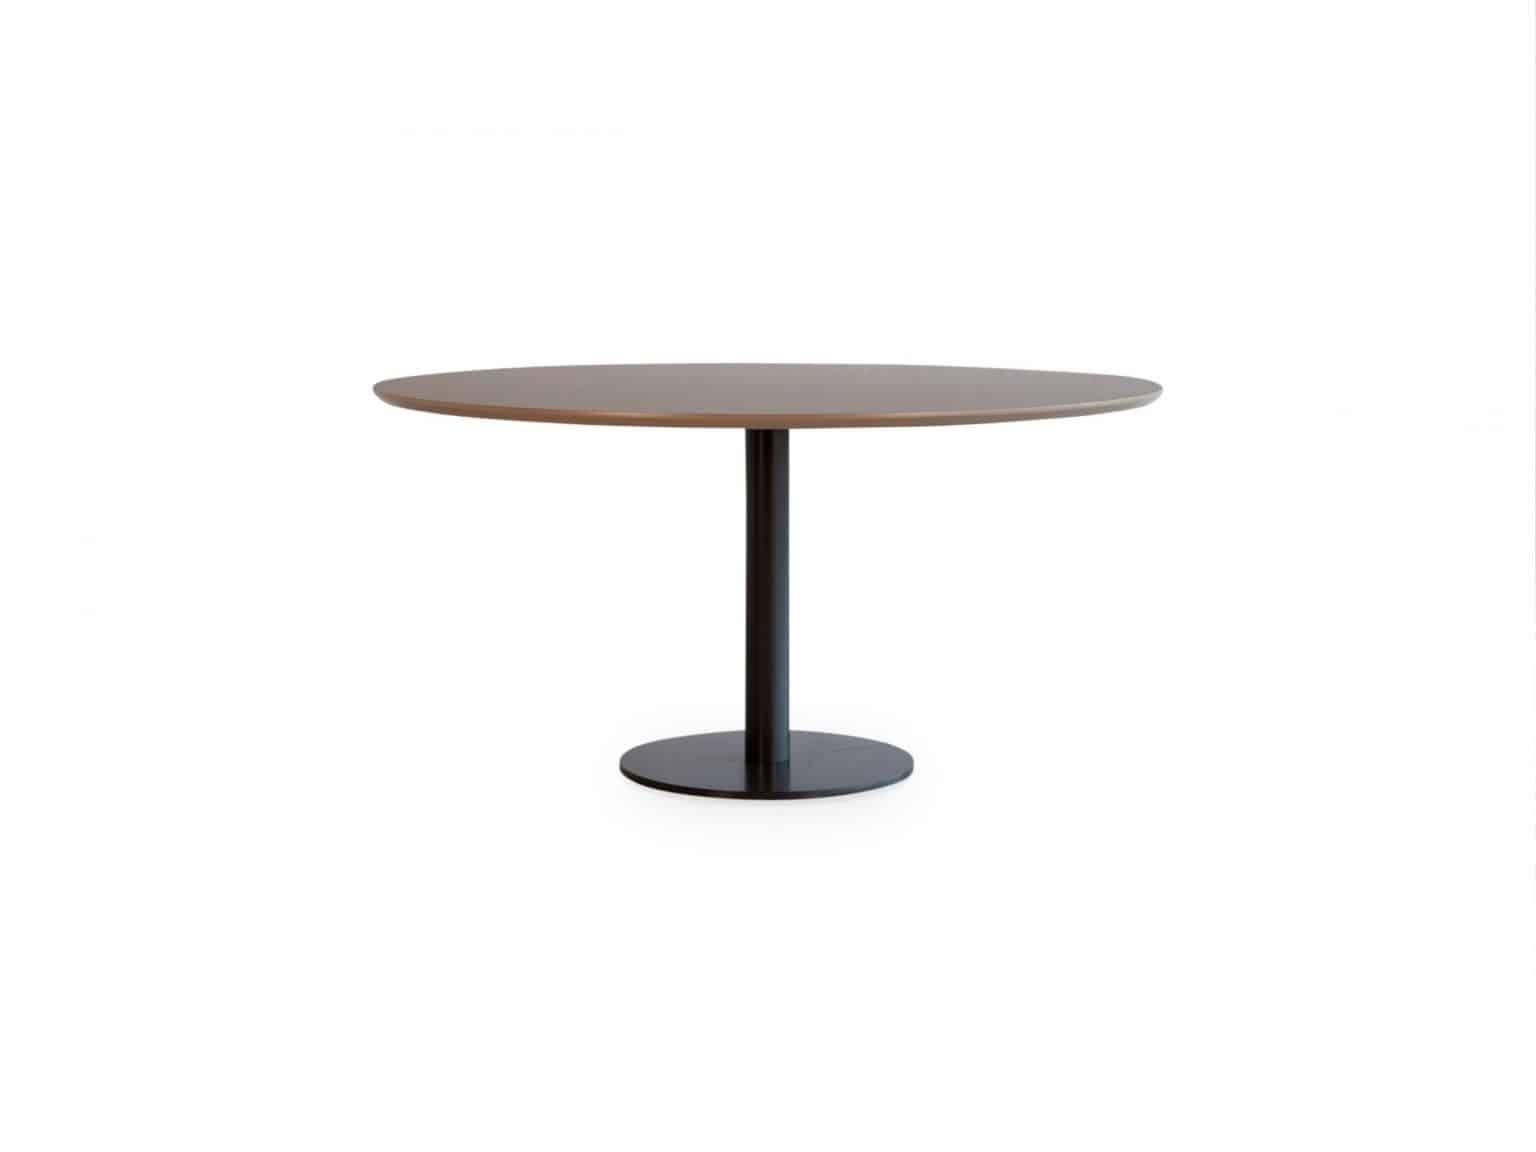 Metaform tafel Orfis pa